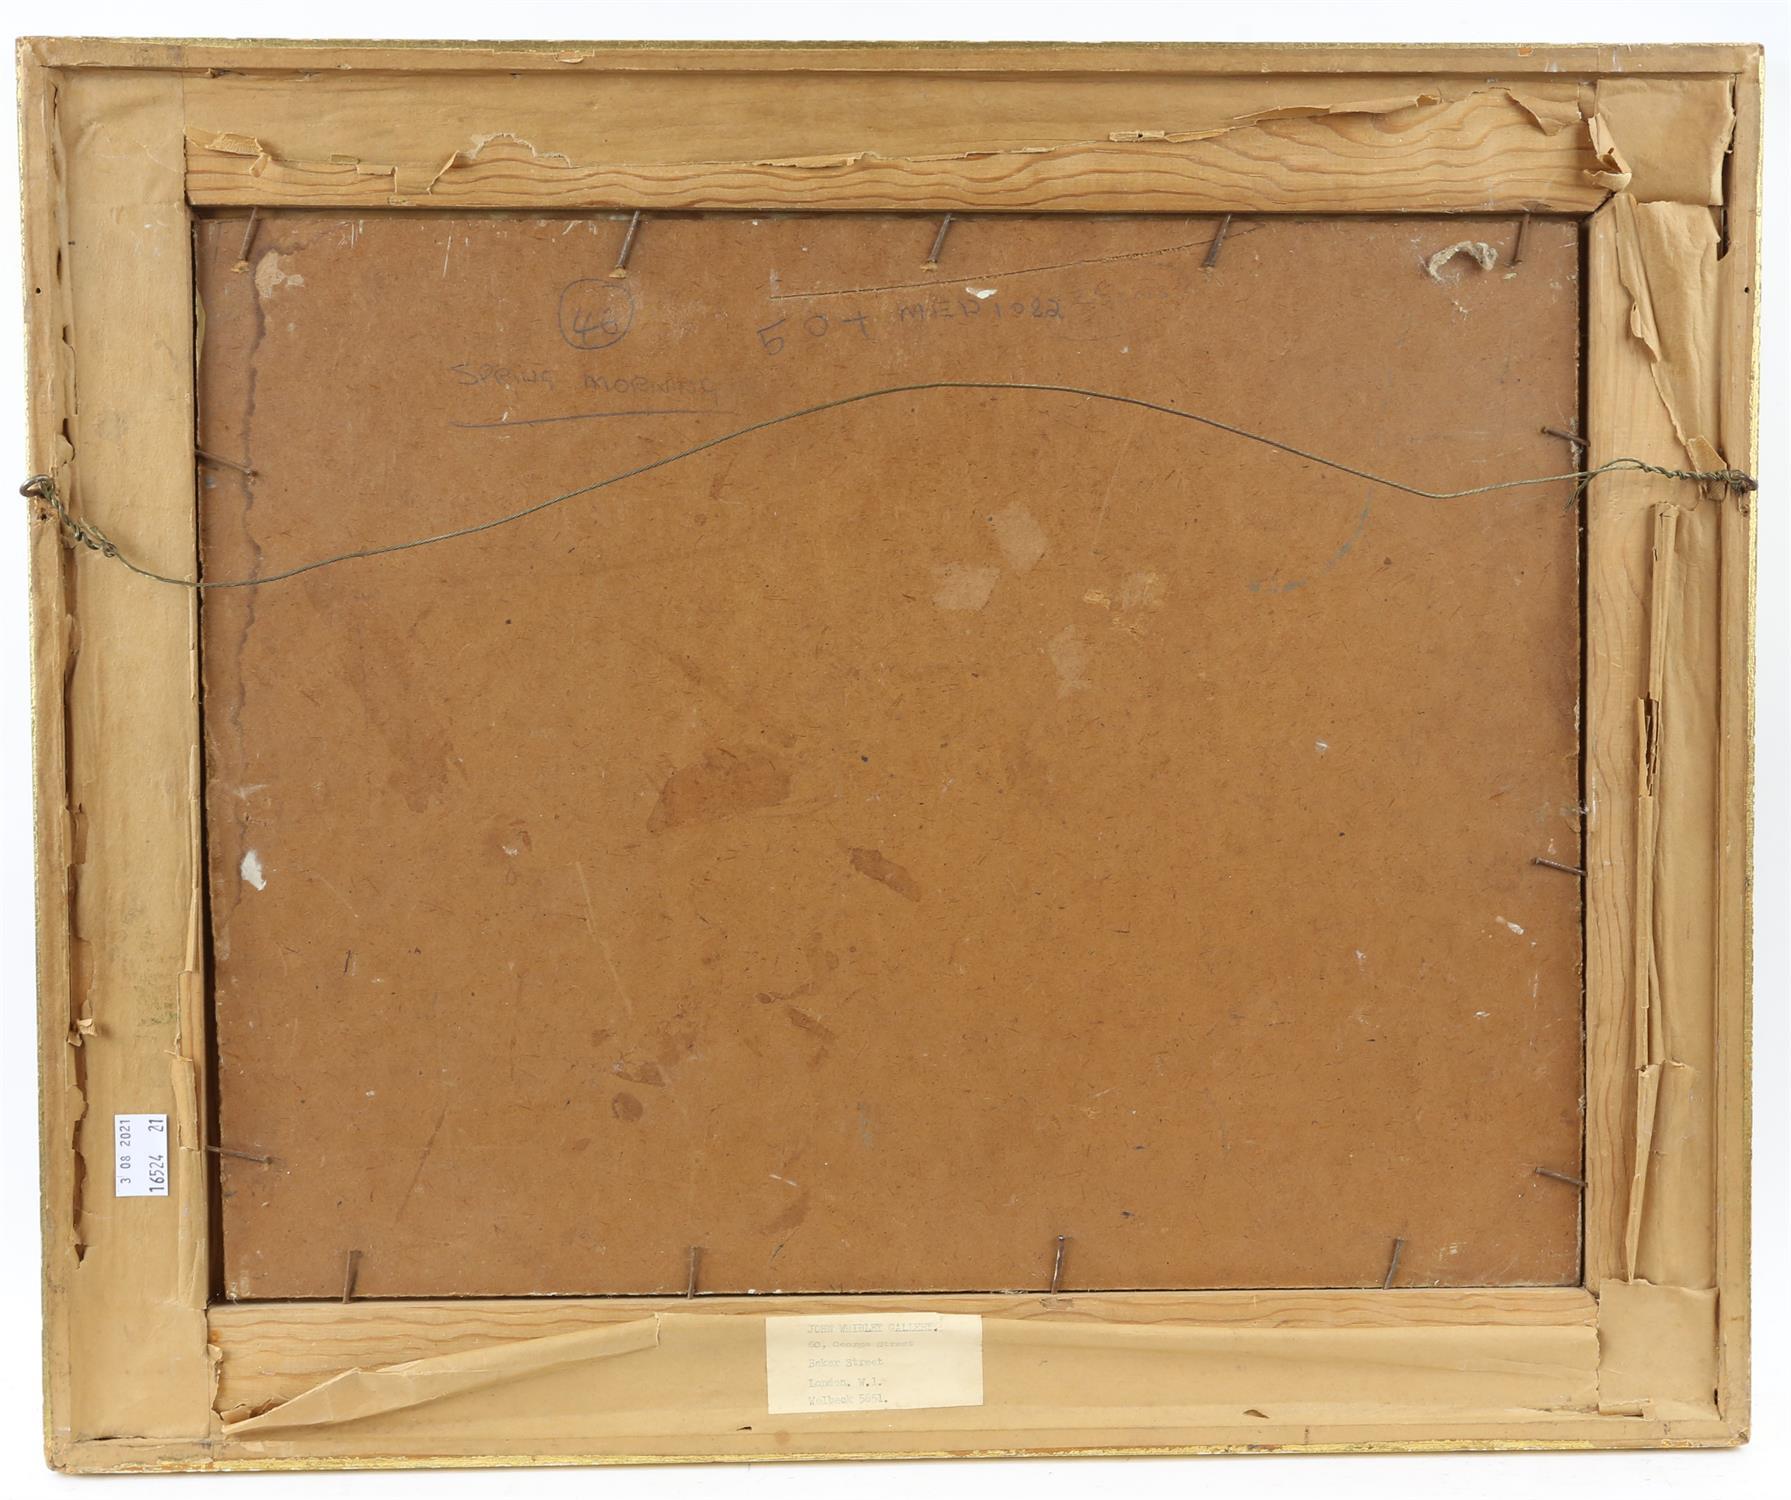 Peter Noel Perkins, abstract landscape. Oil on board. Signed lower left. Framed. Image size 33 x - Image 3 of 7